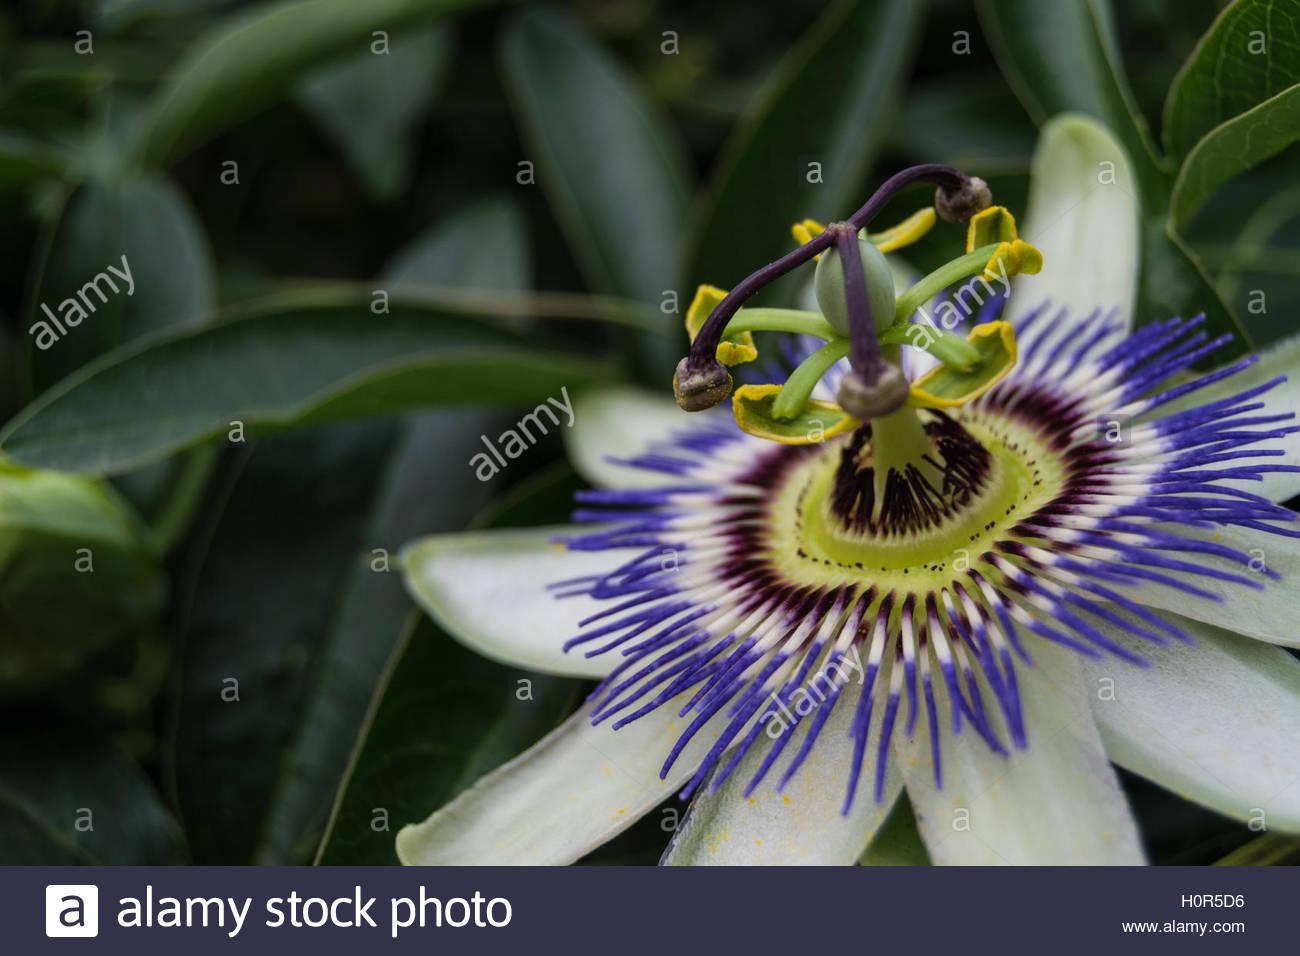 Flower closeup - Stock Image